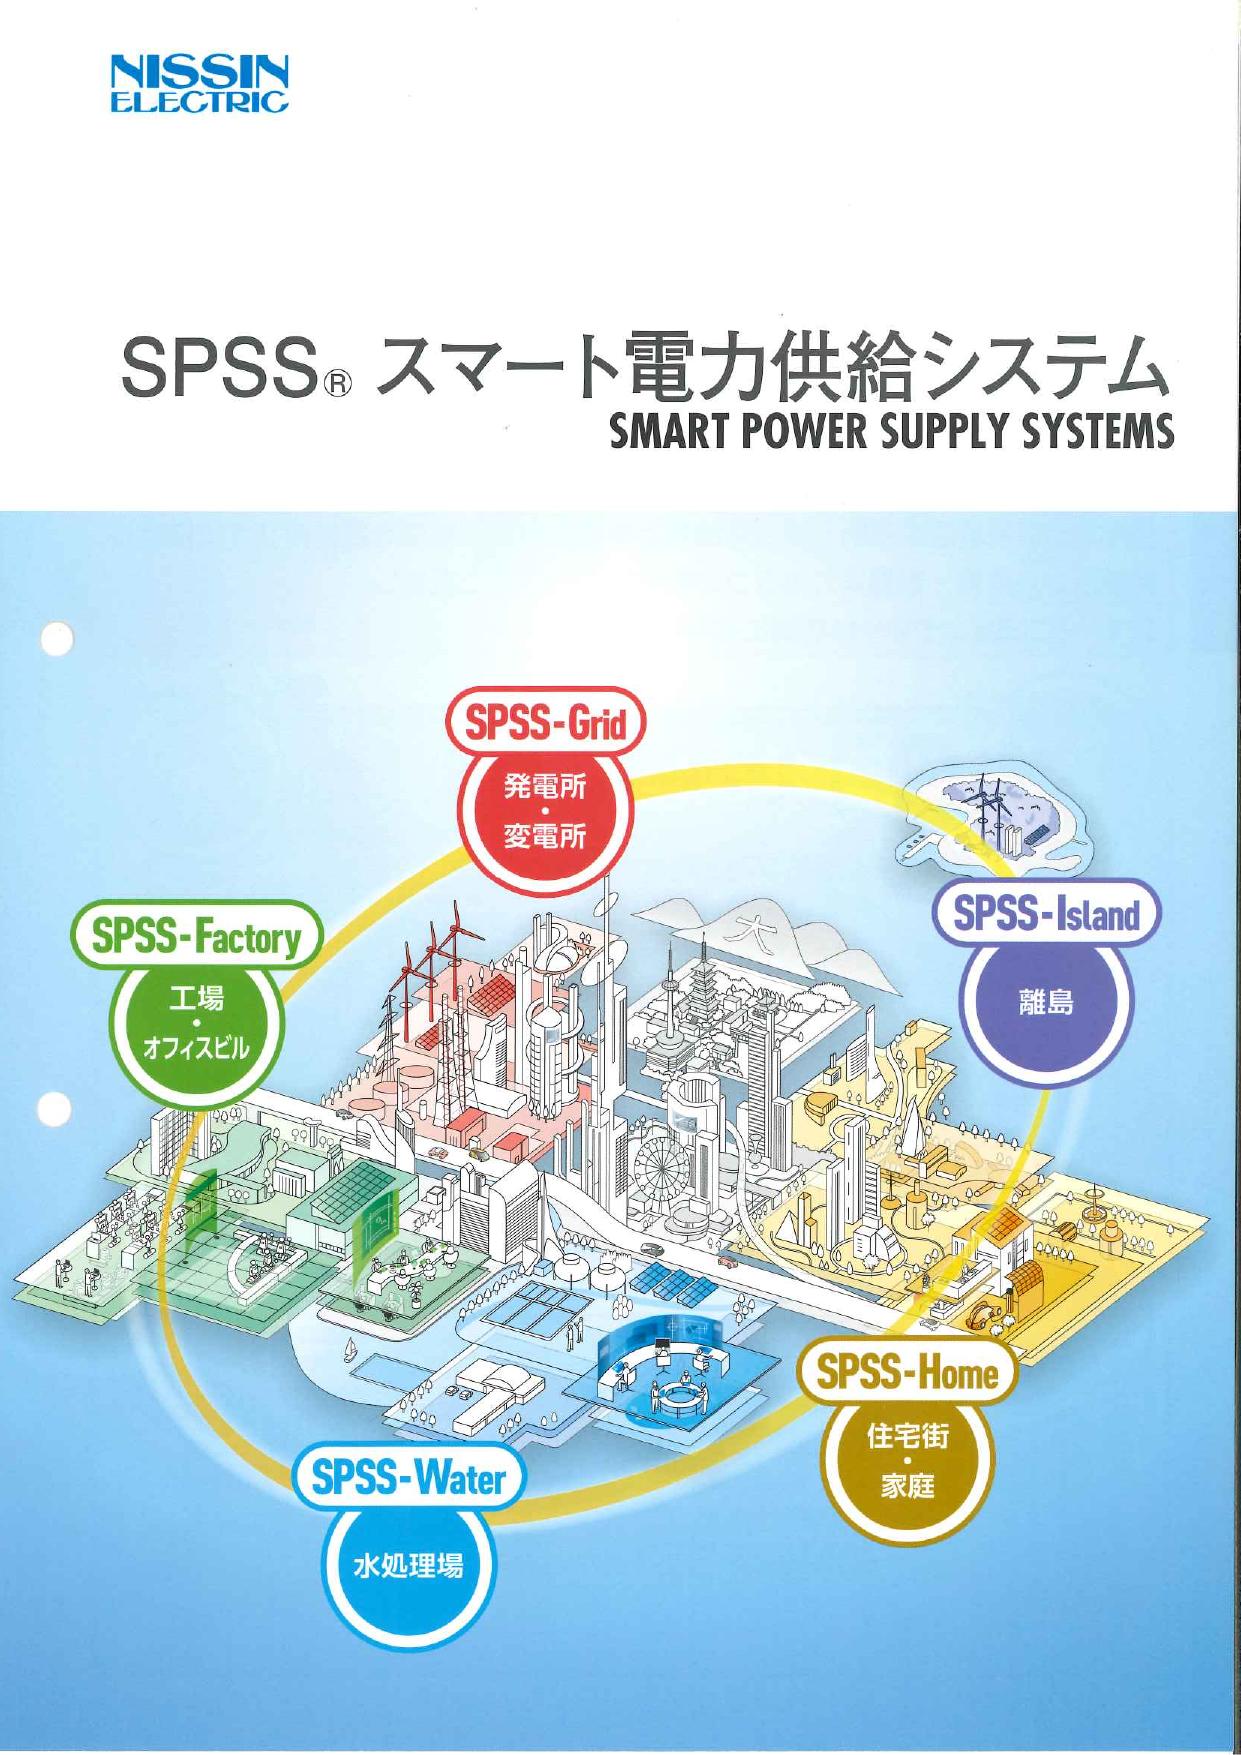 SPSS(R)スマート電力供給システム